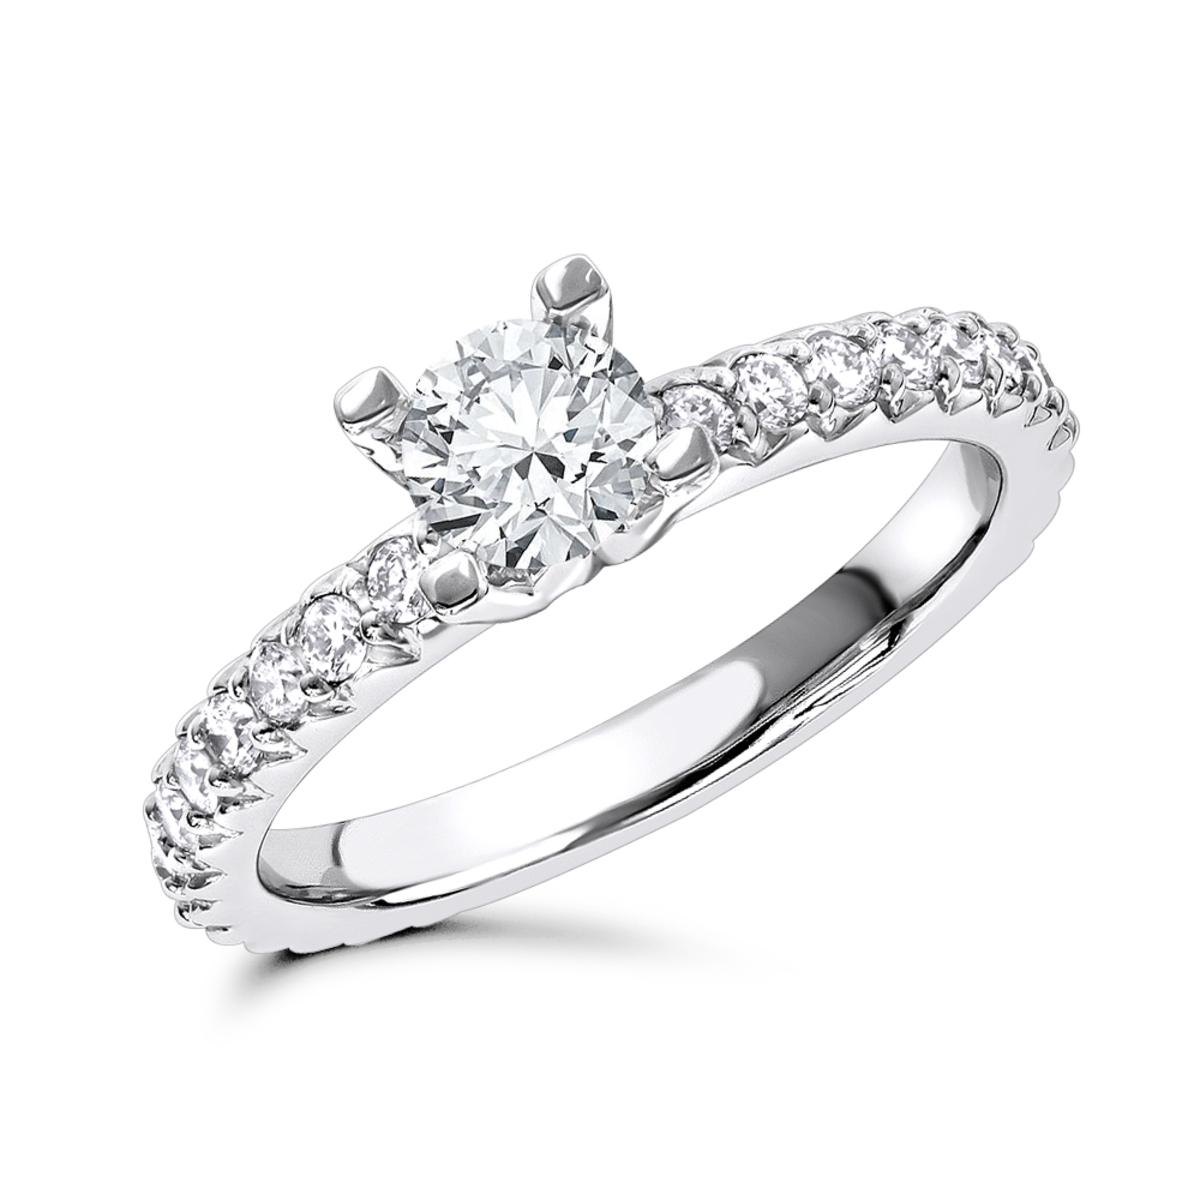 14K Gold Unique Diamond Engagement Ring 1.28ct